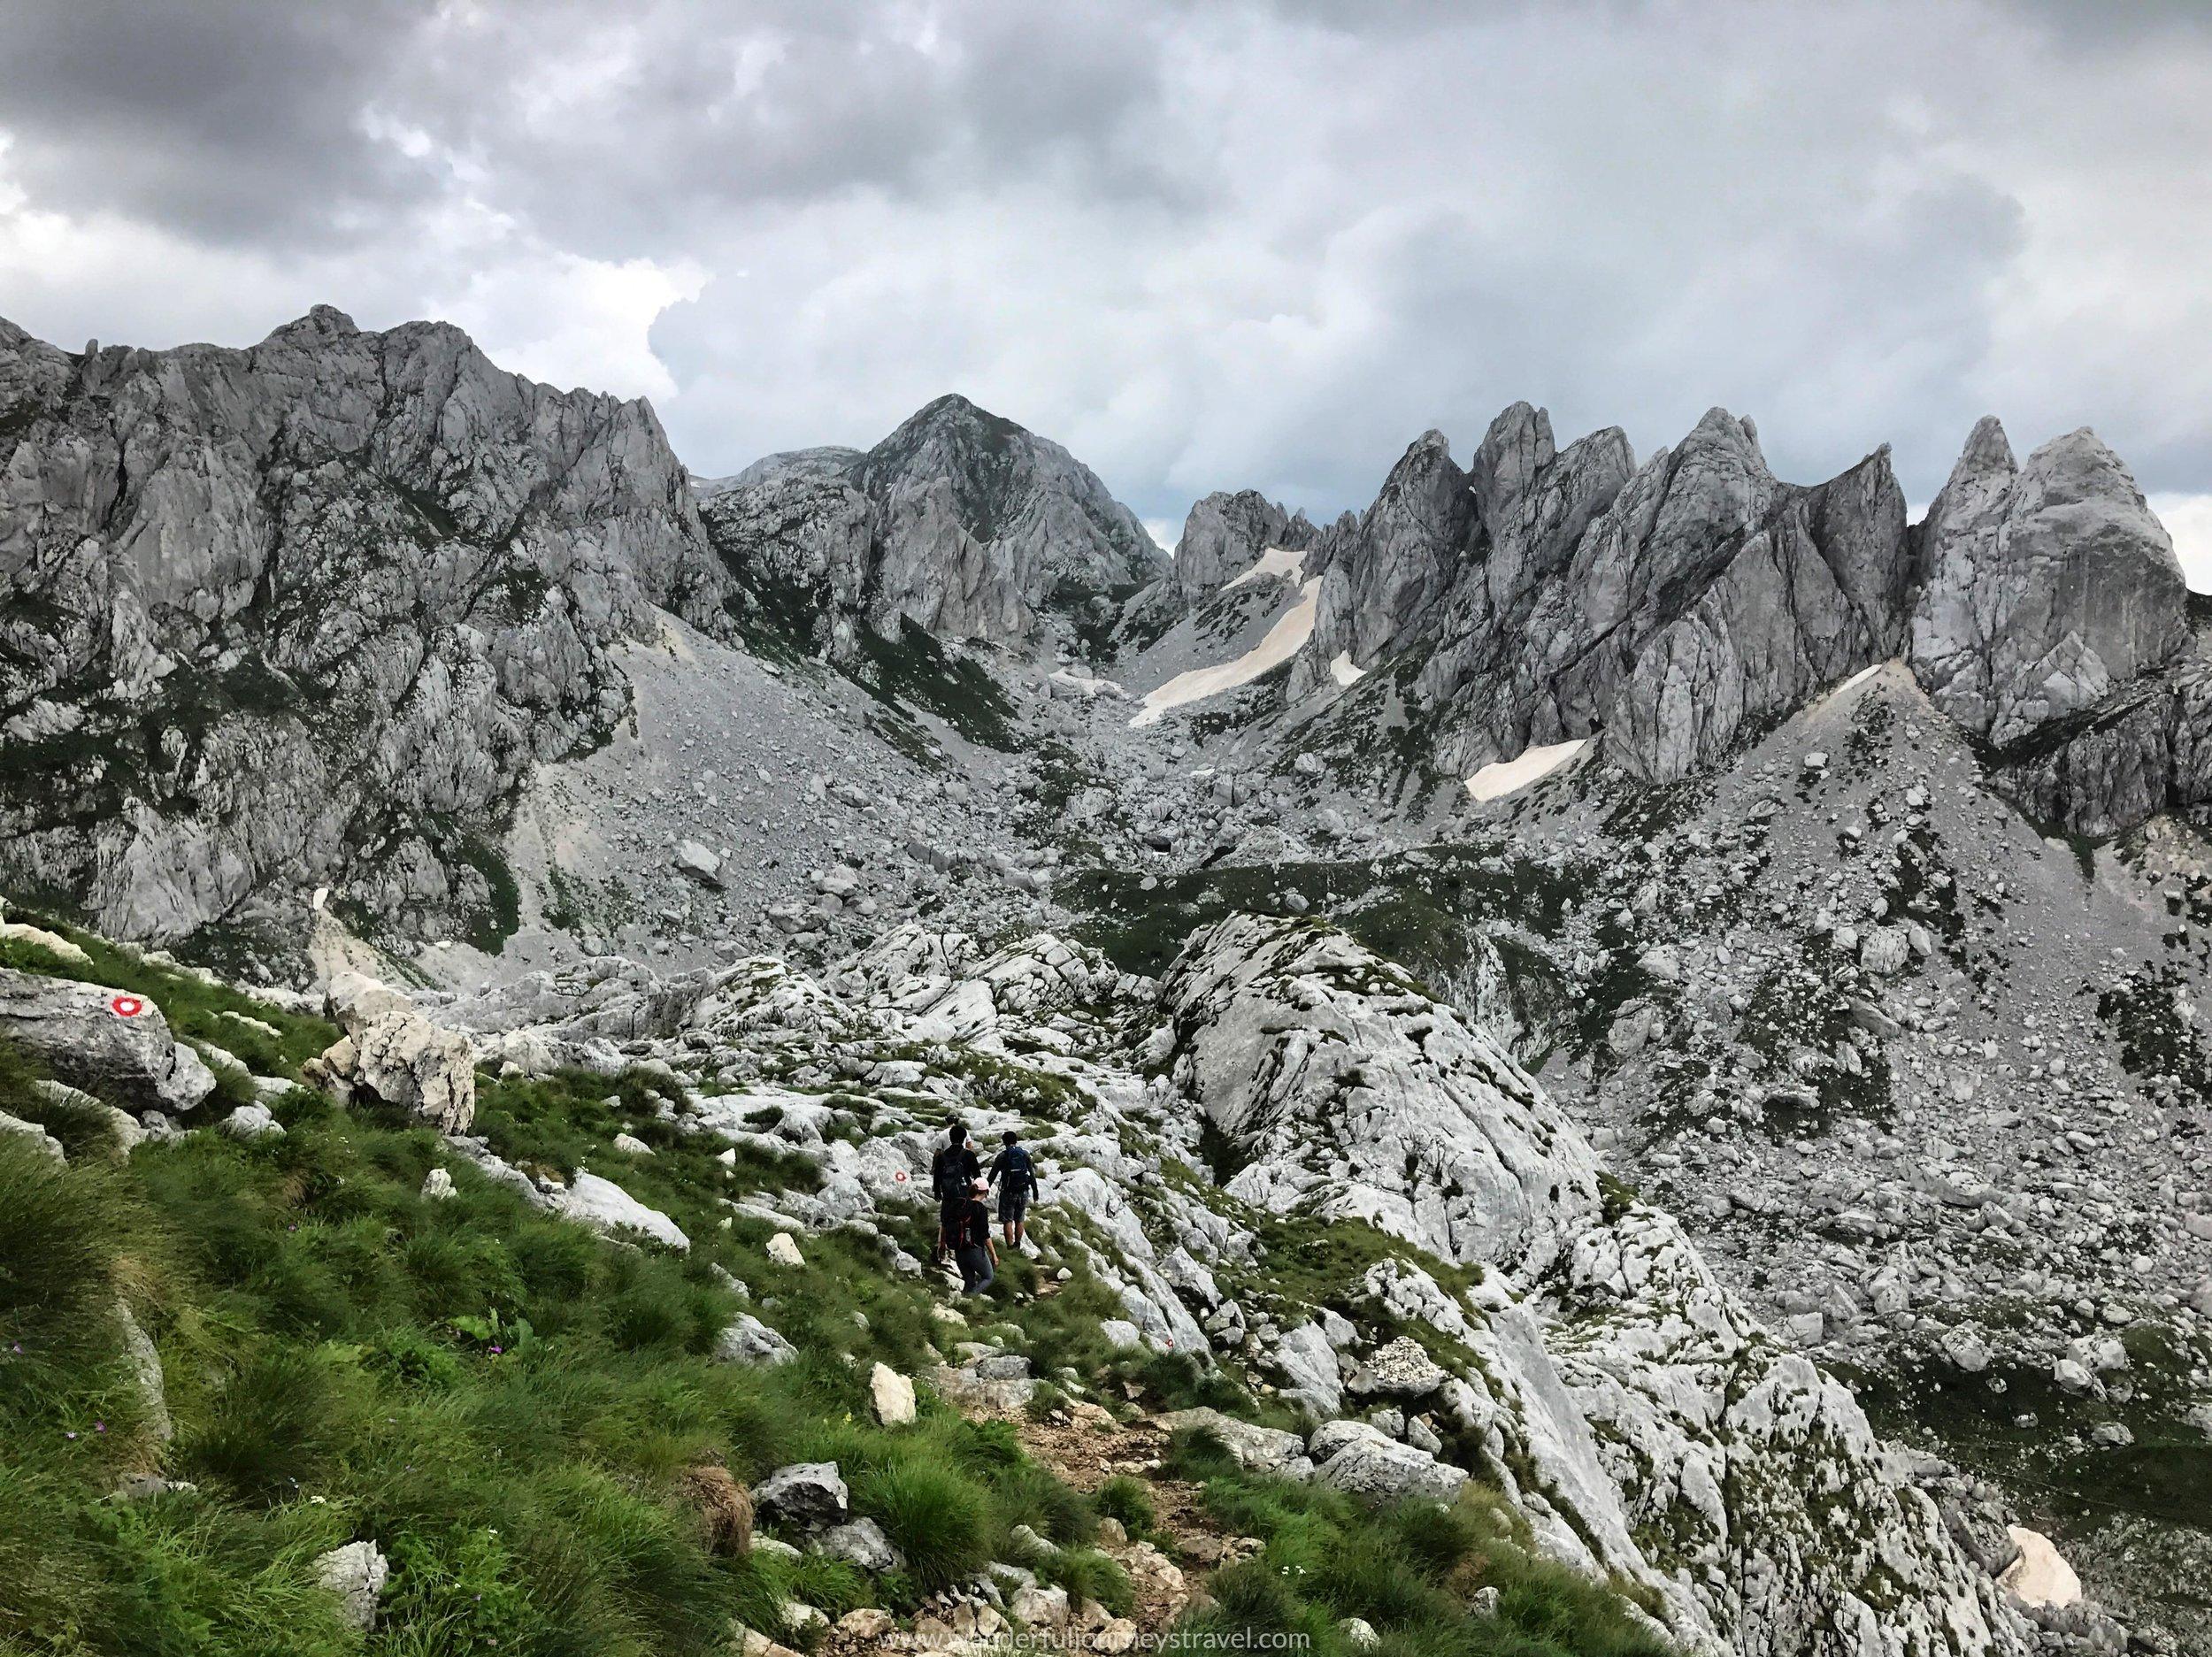 trail-view-bobotov-kuk-montenegro-durmitor-descent.jpg